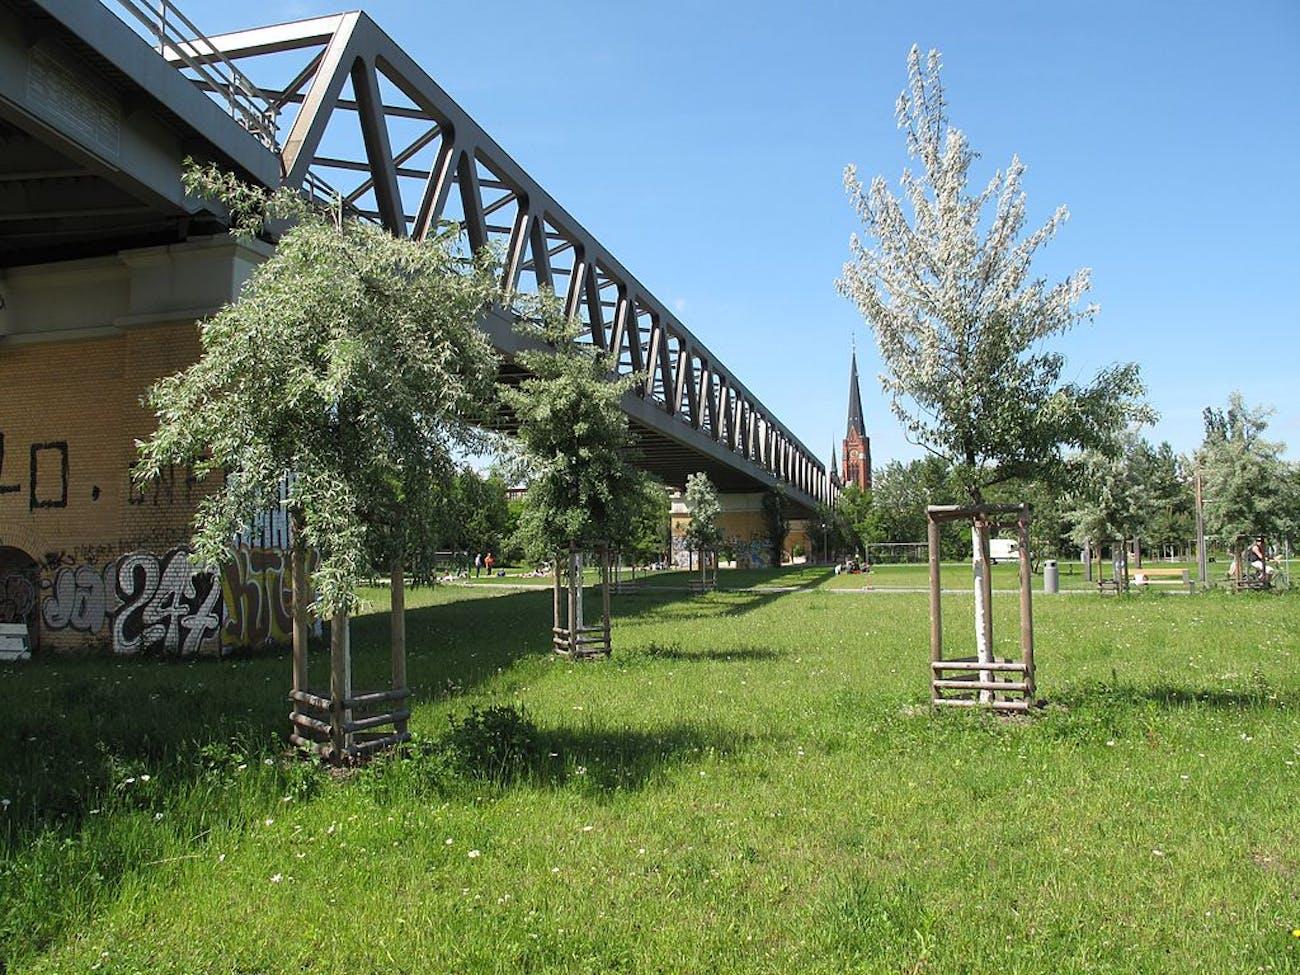 Gleisdreieck park in Germany, and its wild lawn.